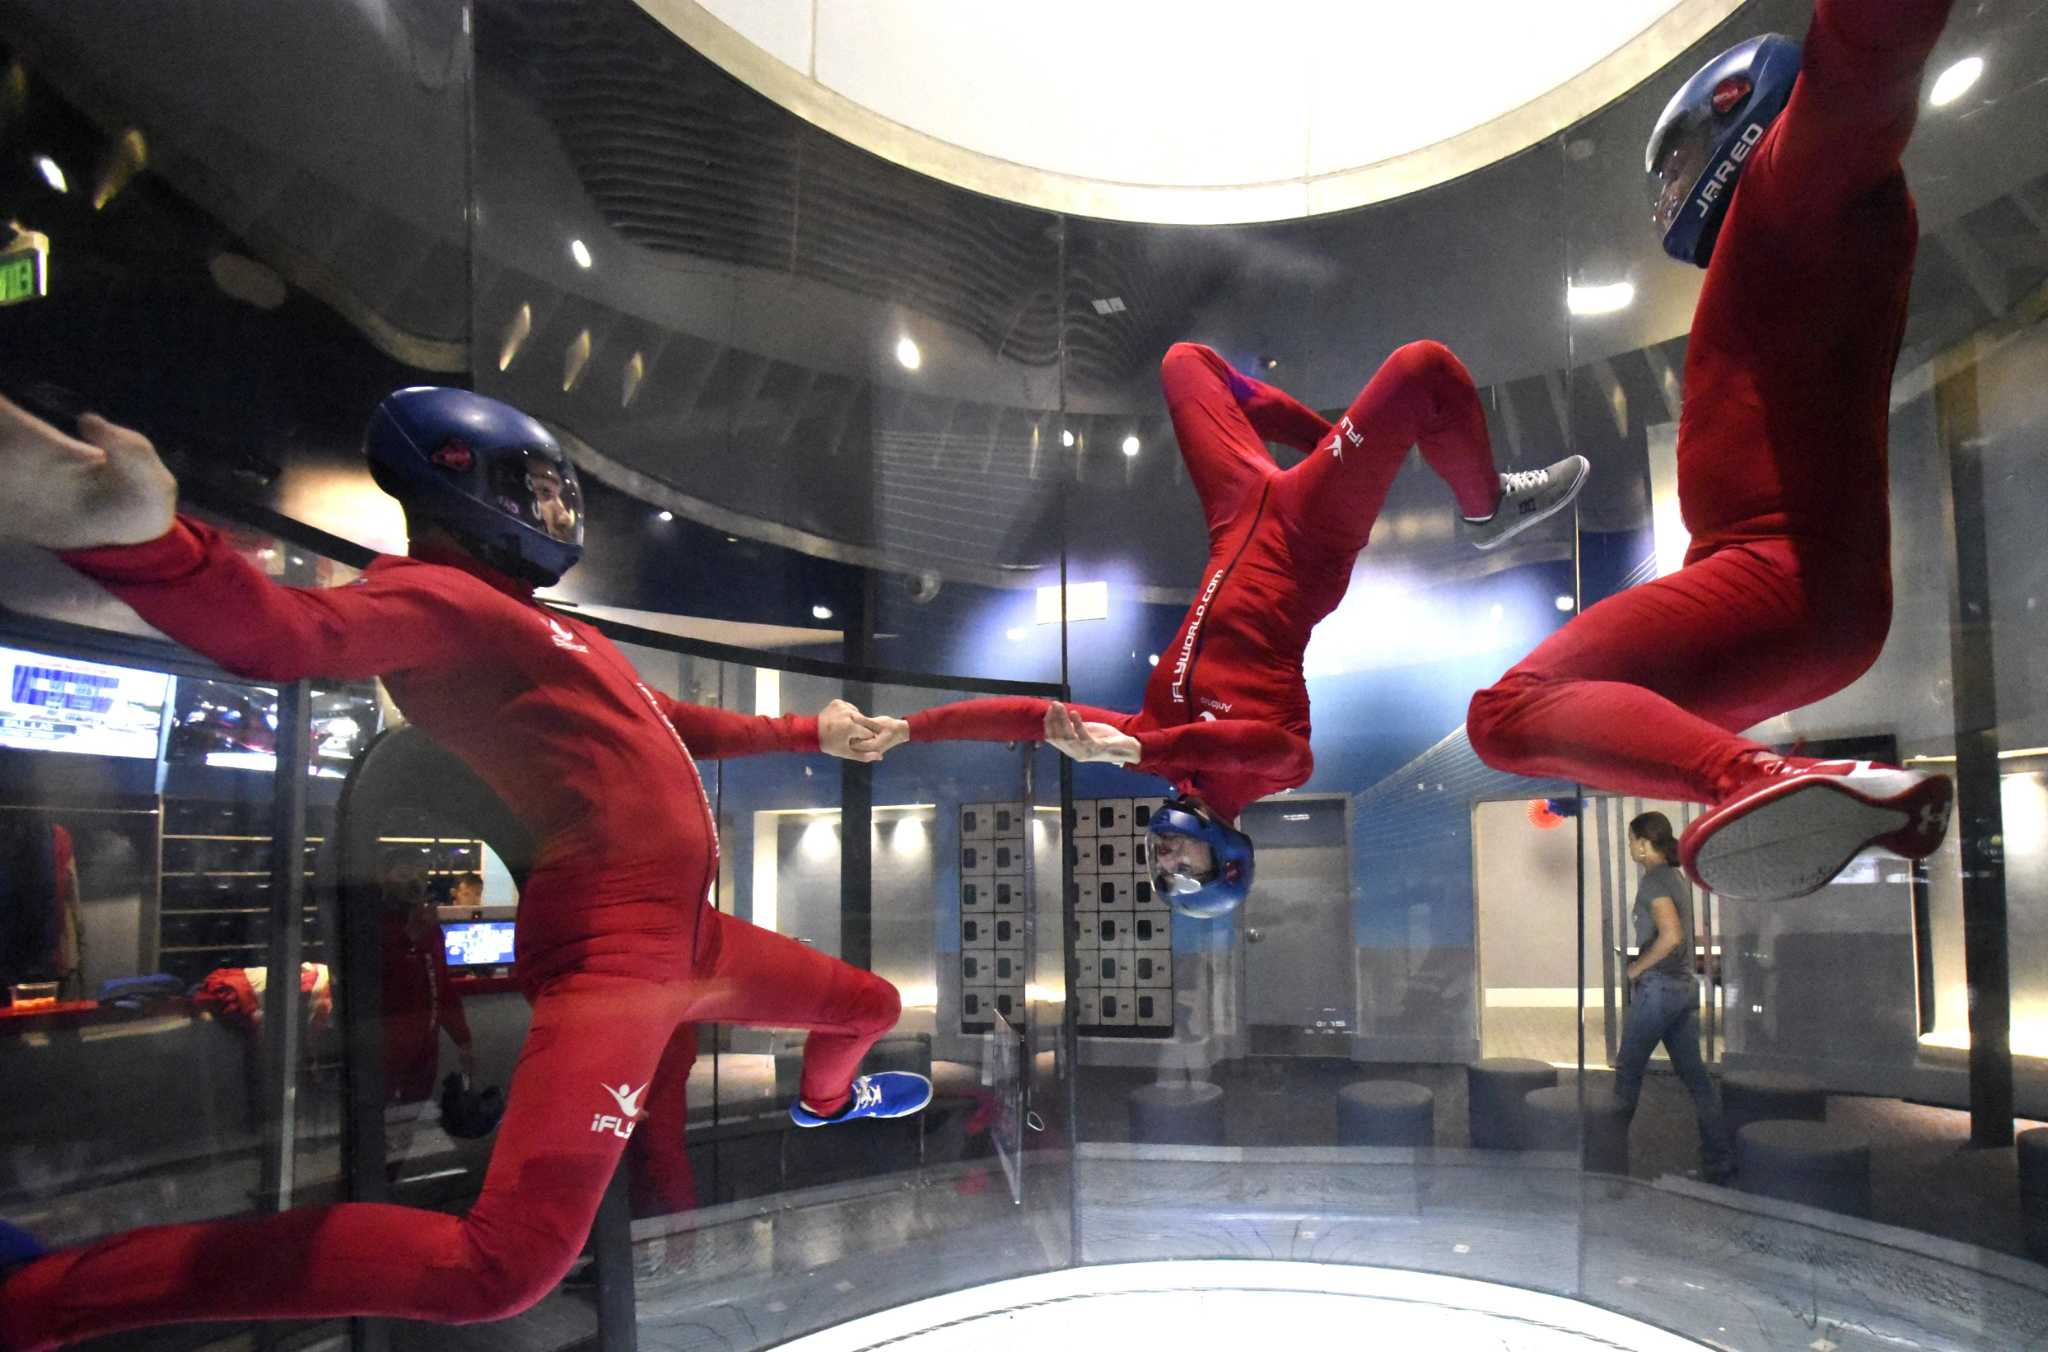 Indoor skydiving simulator, iFLY, opens first location in San Antonio